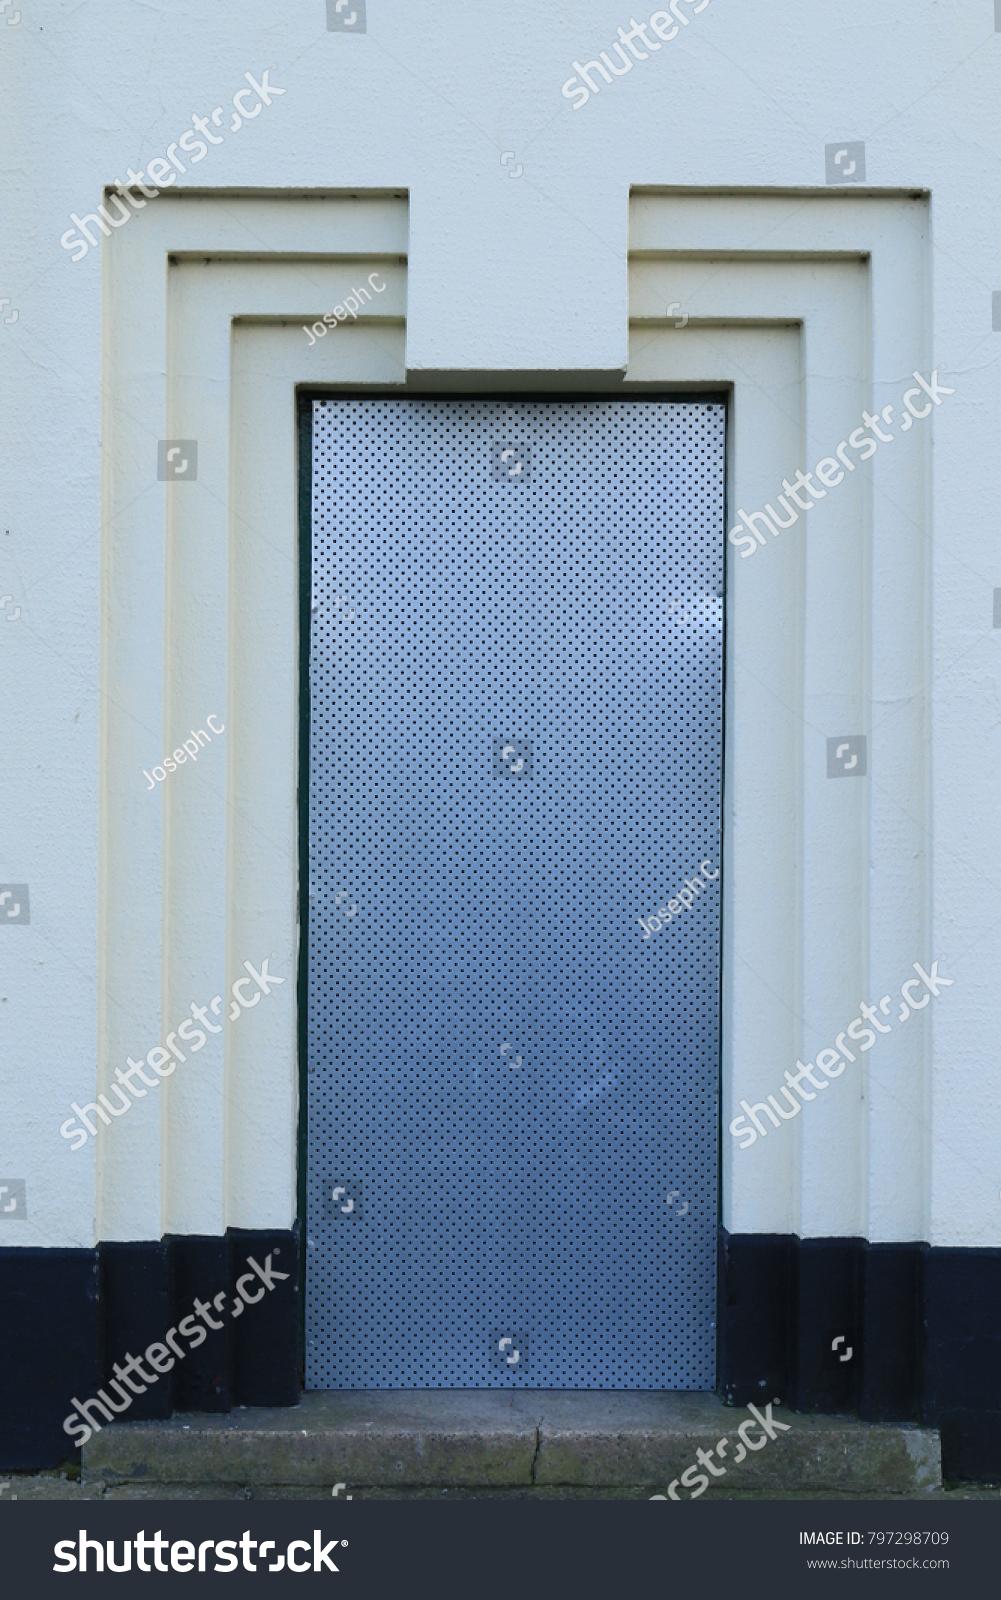 Art Deco Door Frame Art Deco Stock Photo (100% Legal Protection ...